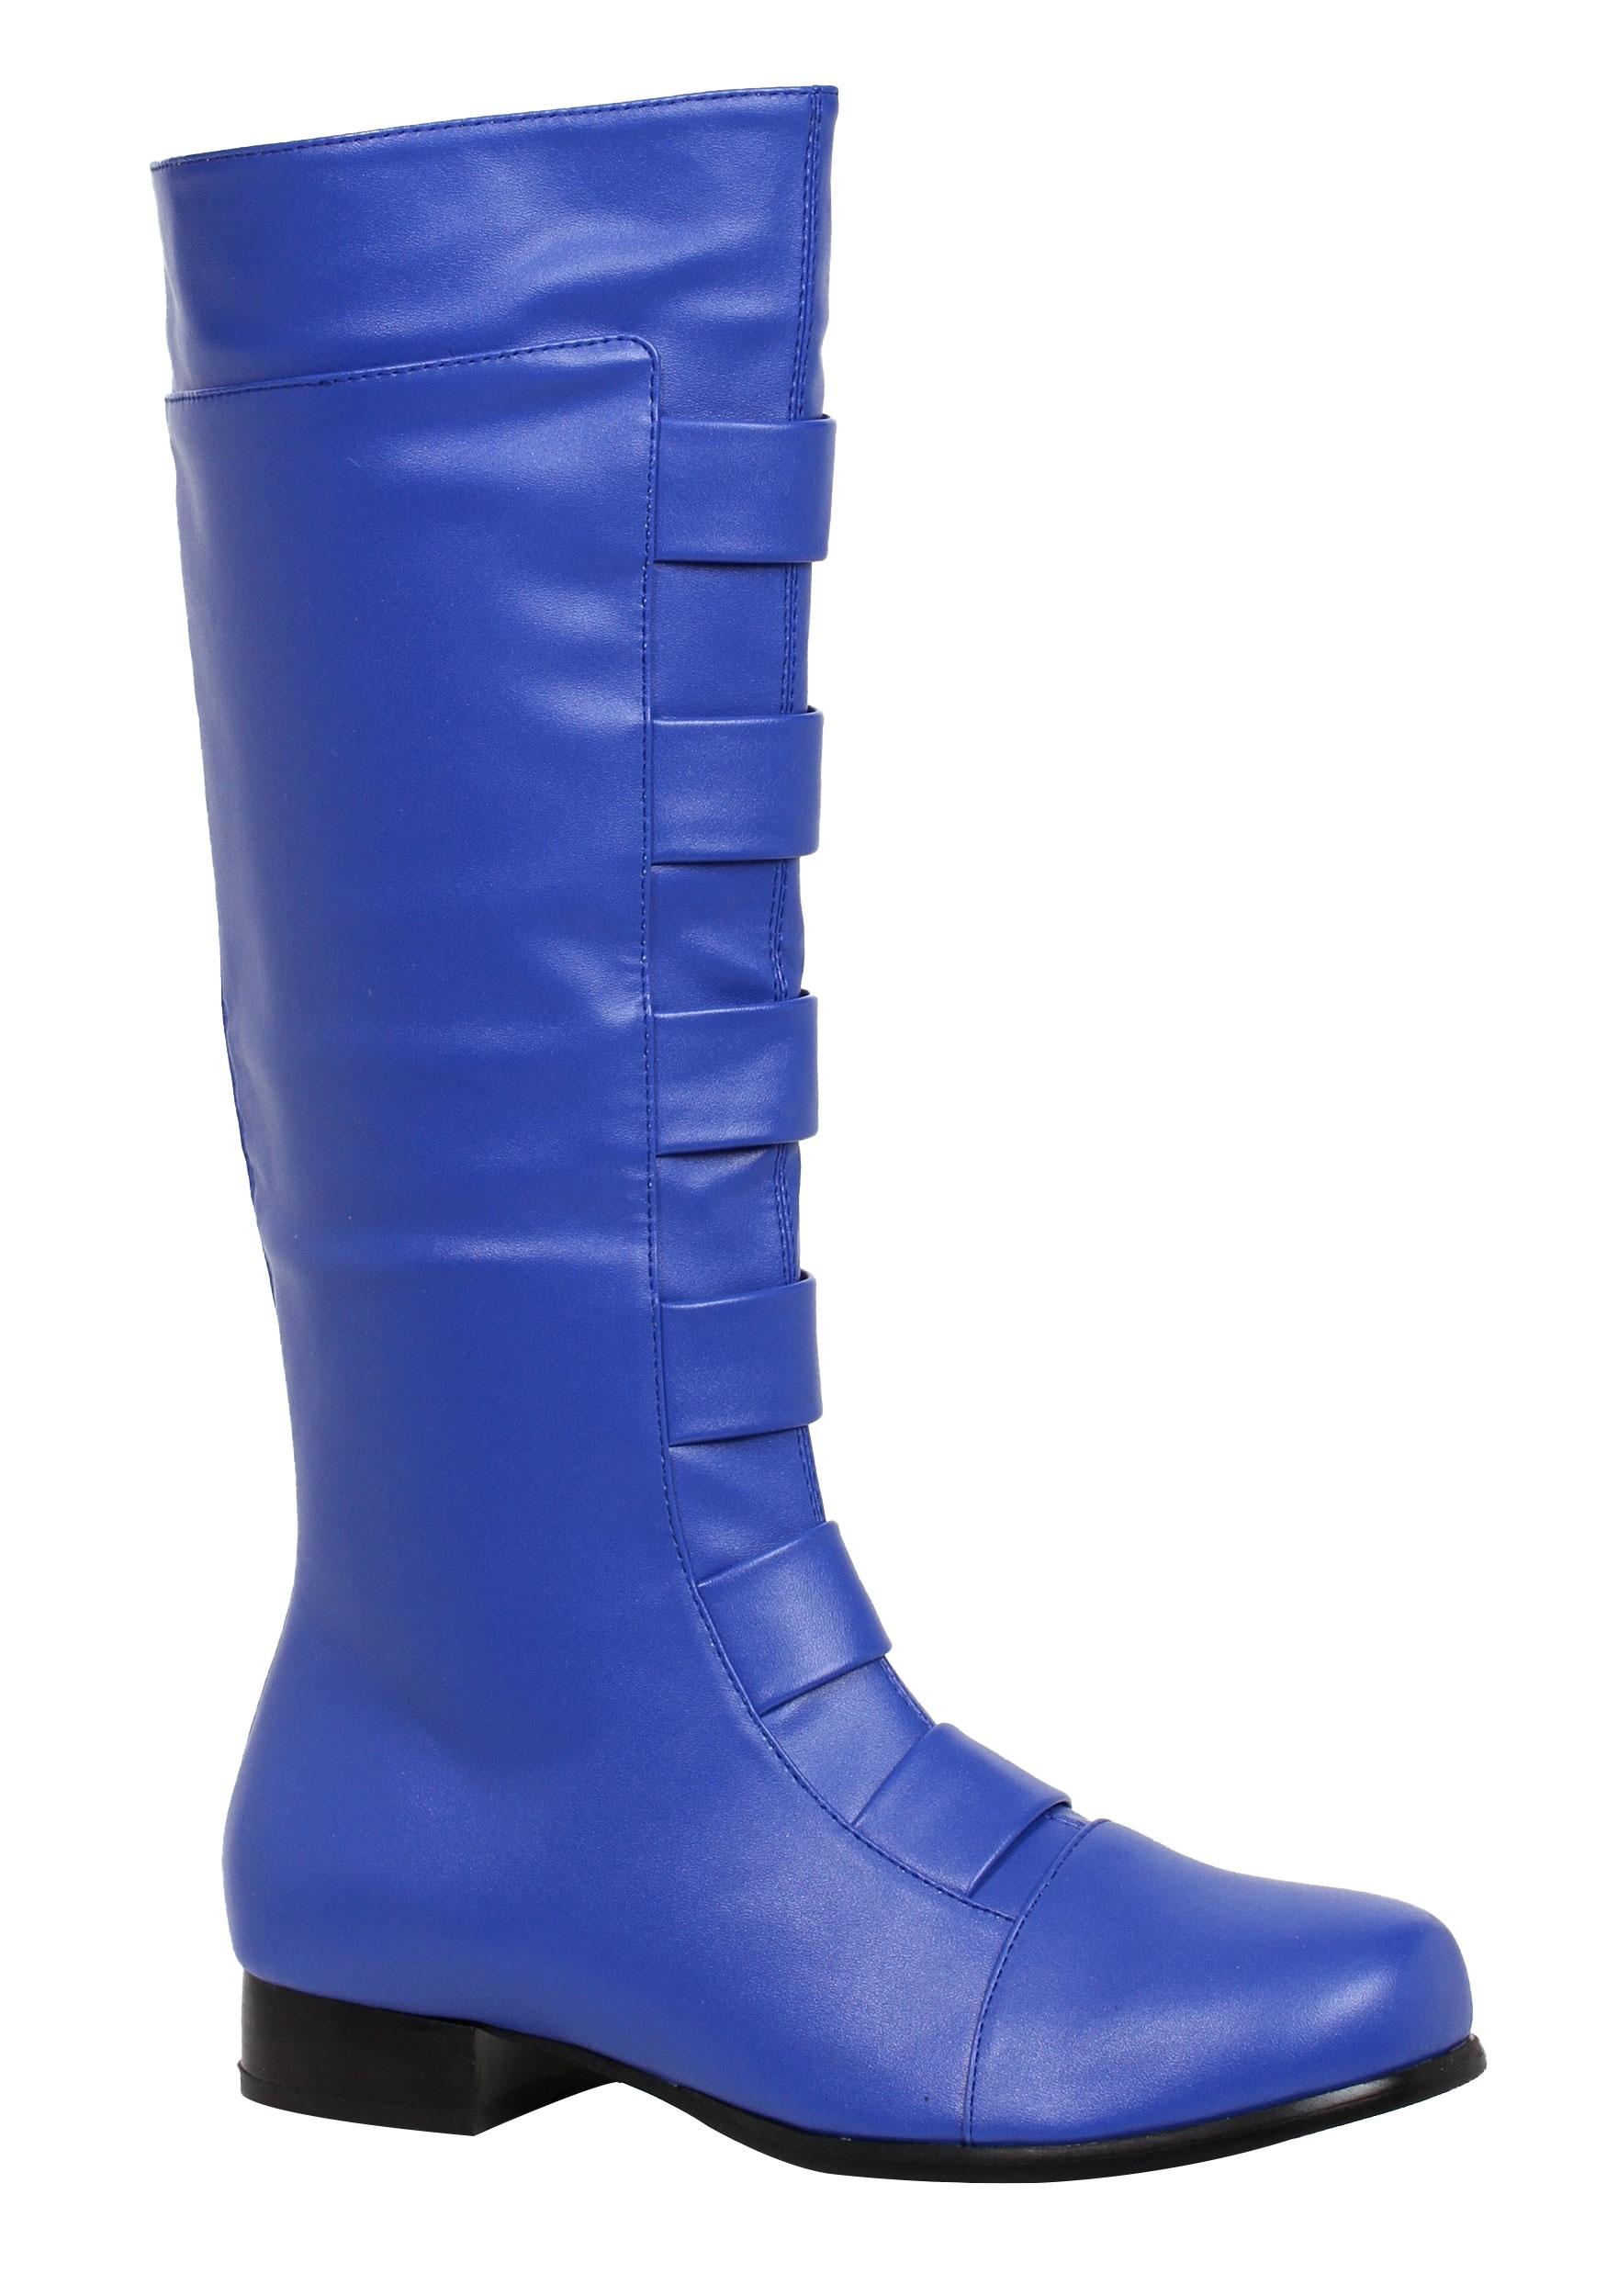 blue boots adult blue superhero boots reqozkw